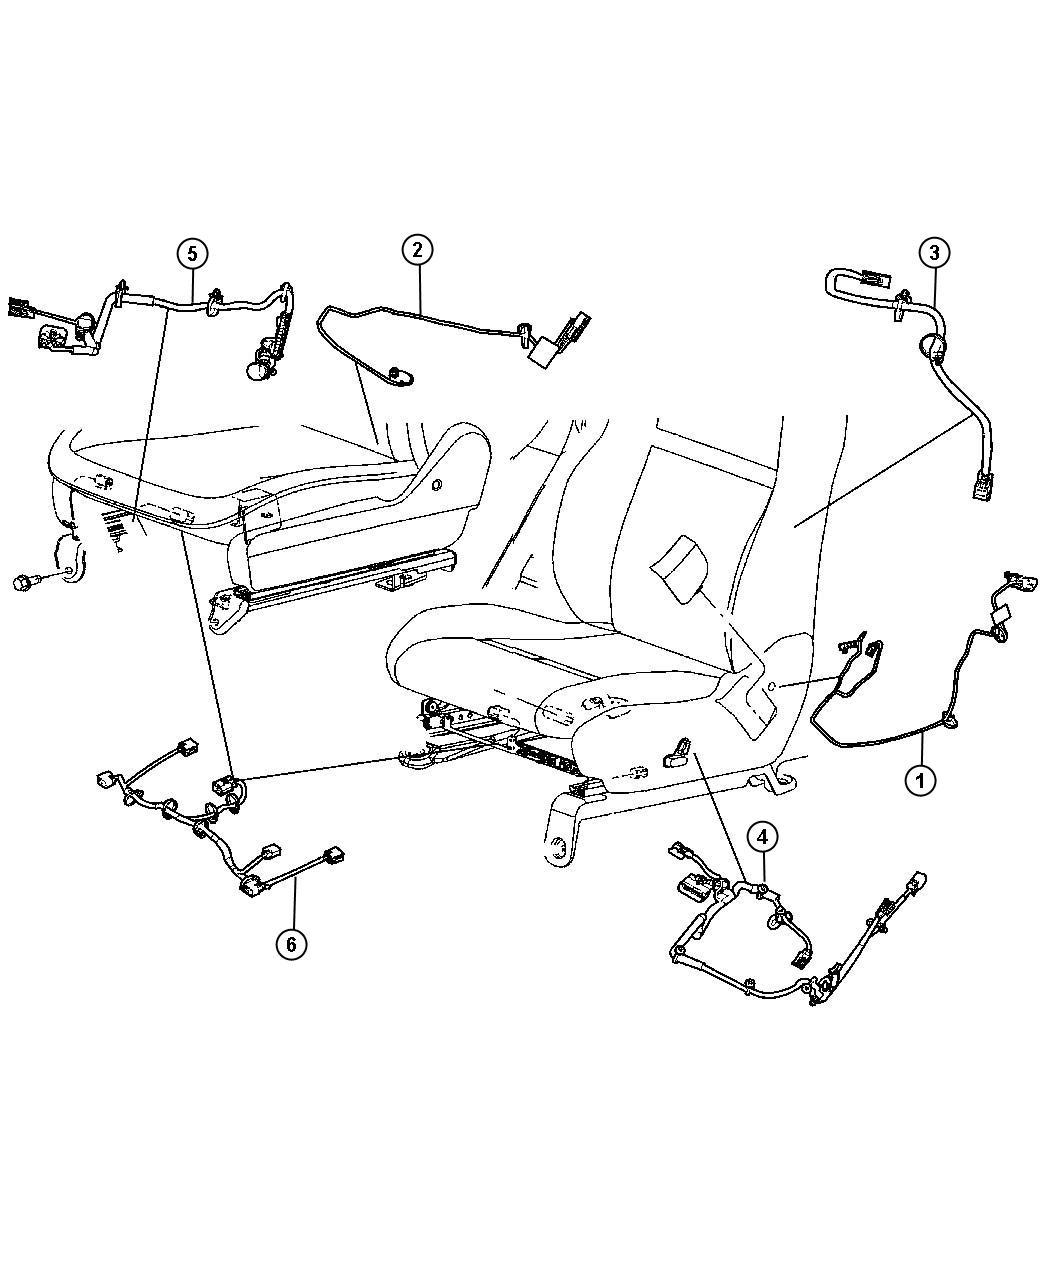 Jeep Grand Cherokee Wiring  Power Seat  Active Head Restraint  8 Way  Lumbar  Heated